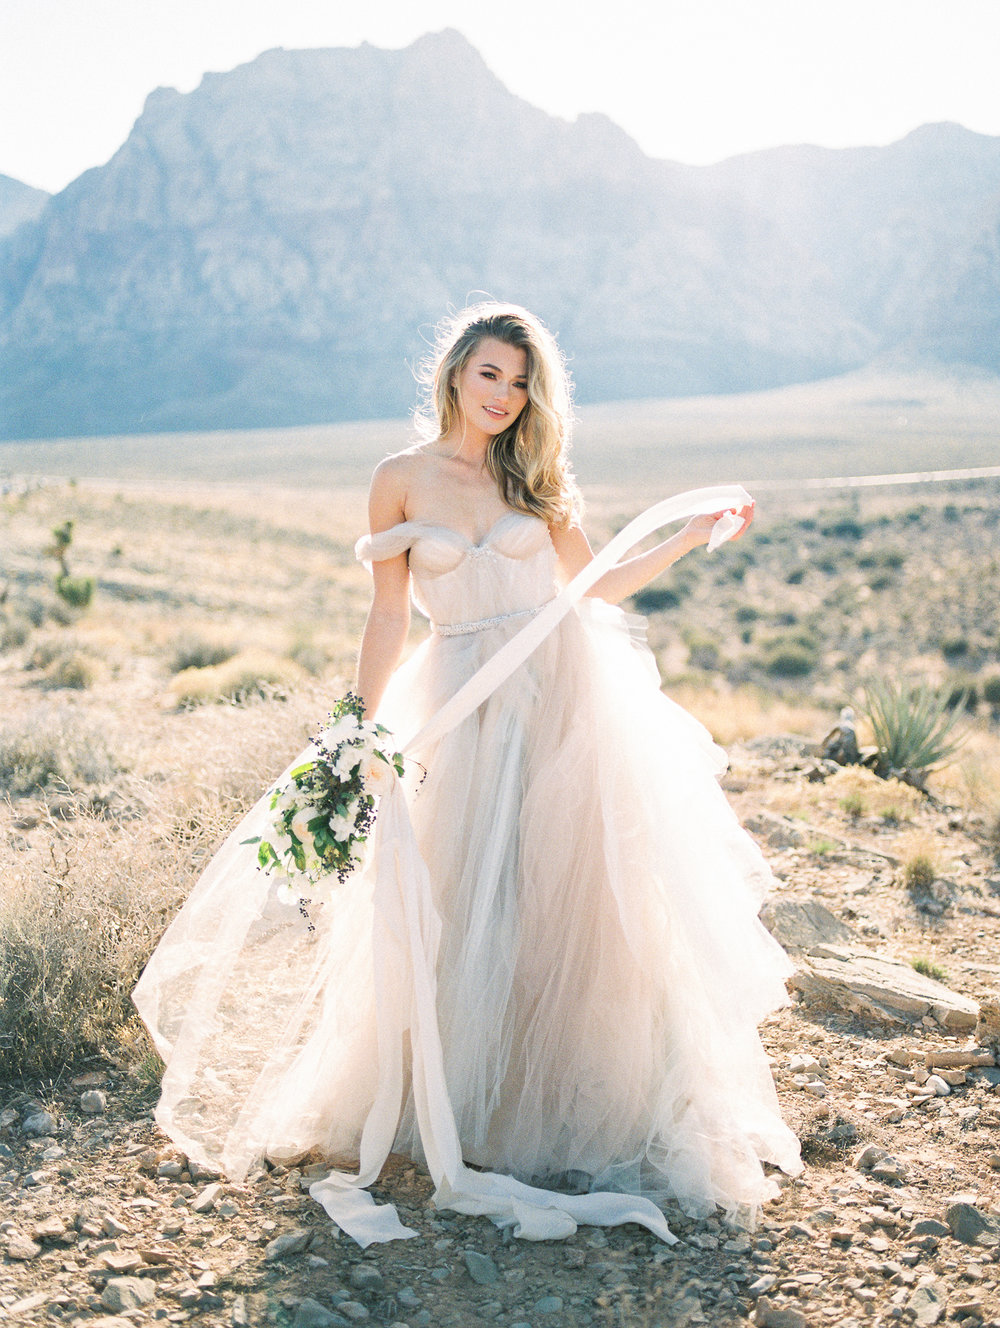 Brittany Bekas - Las Vegas Chicago Wedding Photographer-12.jpg